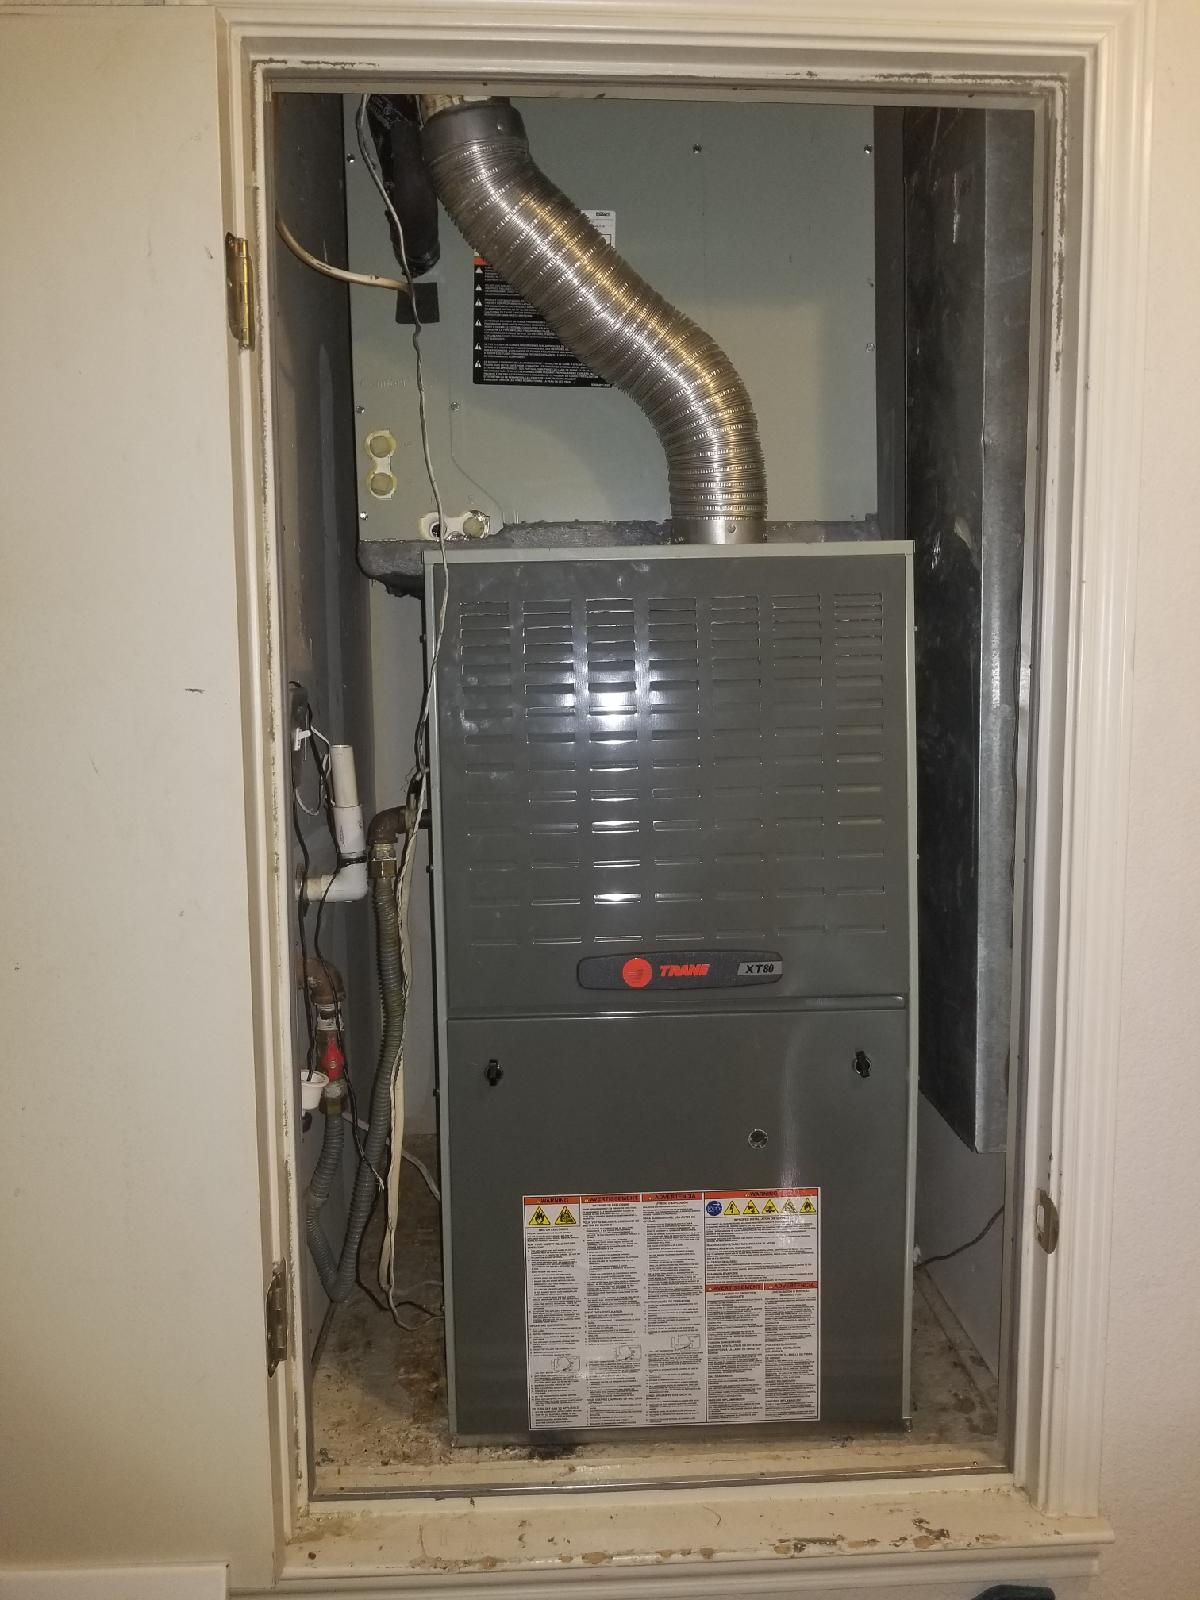 Beasley Trane Furnace Install